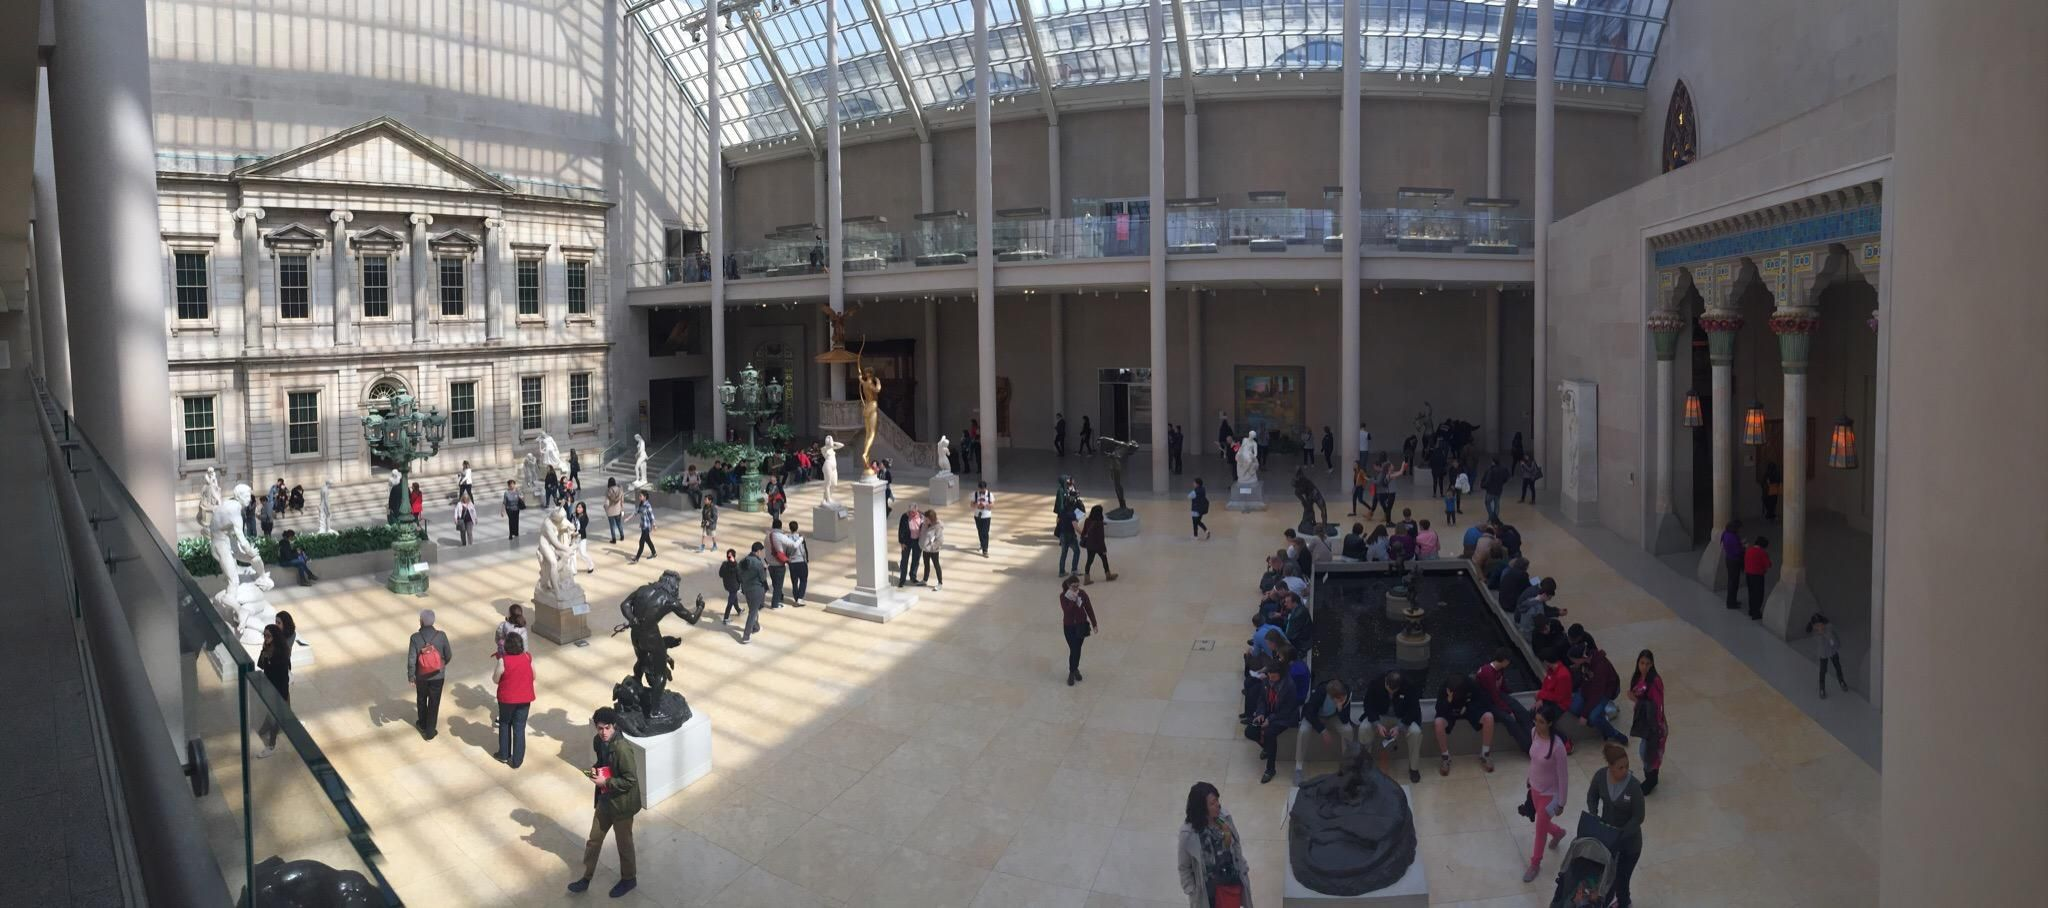 متحف المتروبوليتان للفنون Metropolitan Museum Metropolitan Museum Of Art City